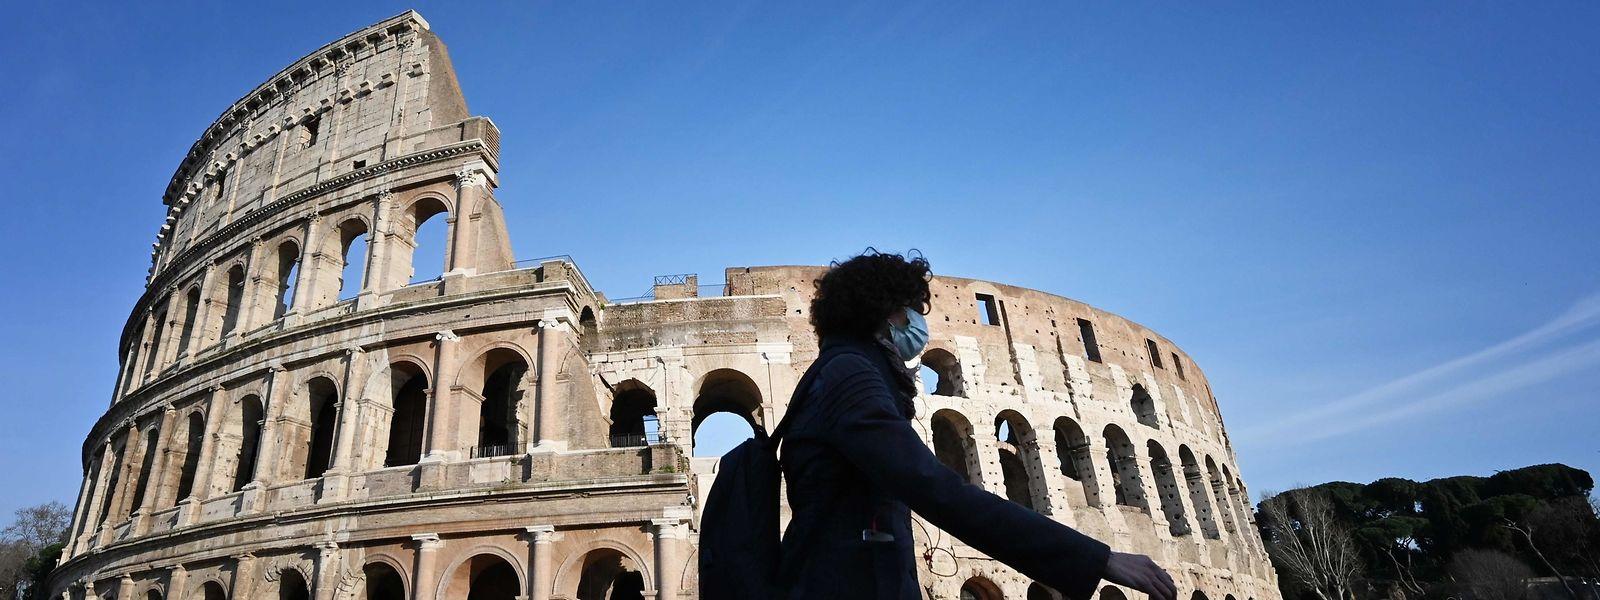 Auch Rom leidet unter dem Corona-Virus.